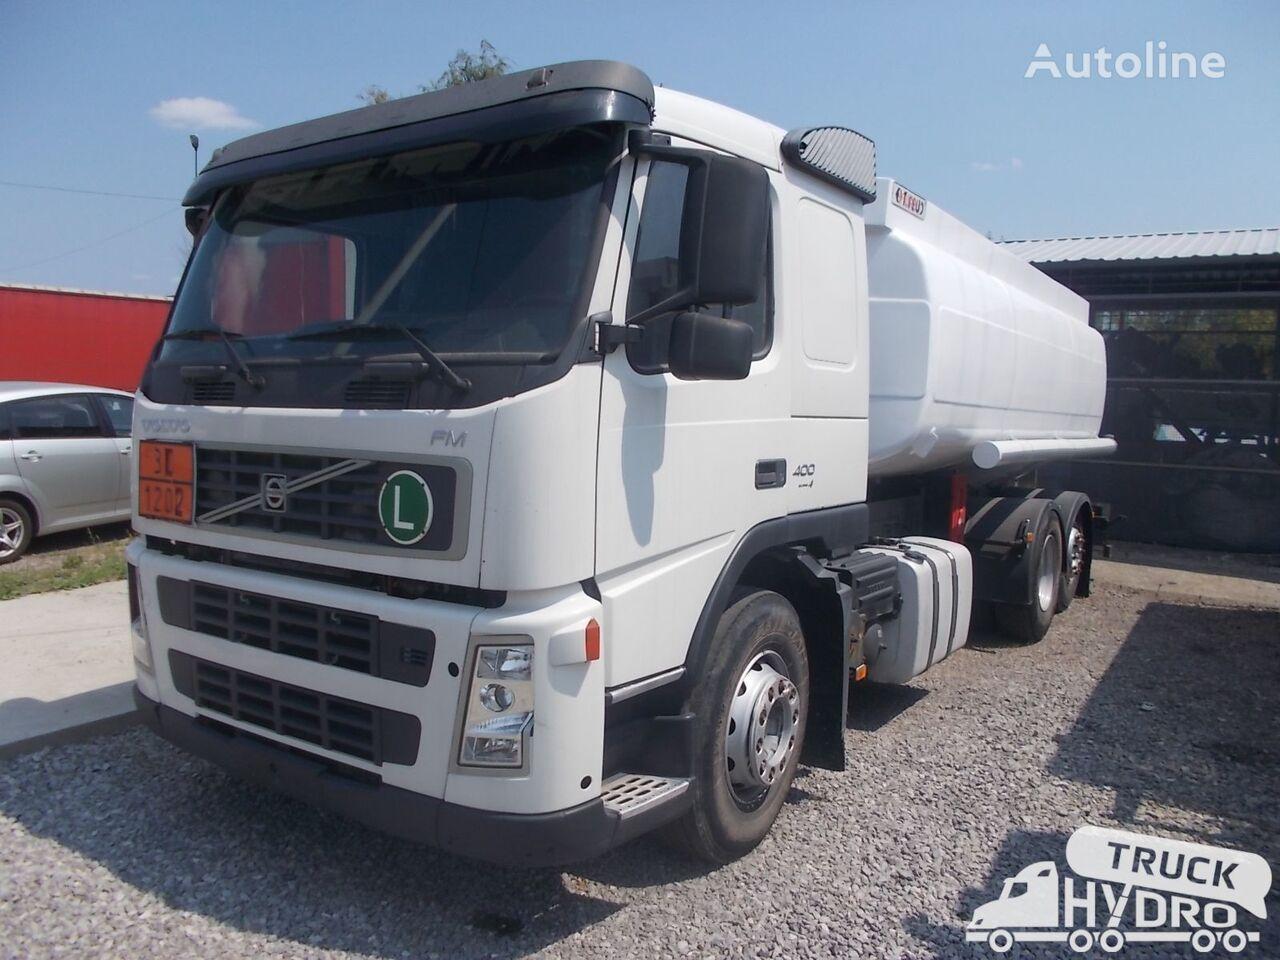 камион цистерна за горива VOLVO FM 6XR - DO PRZEWOZU PALIW PŁYNNYCH KLASY 3 ADR - EURO 4